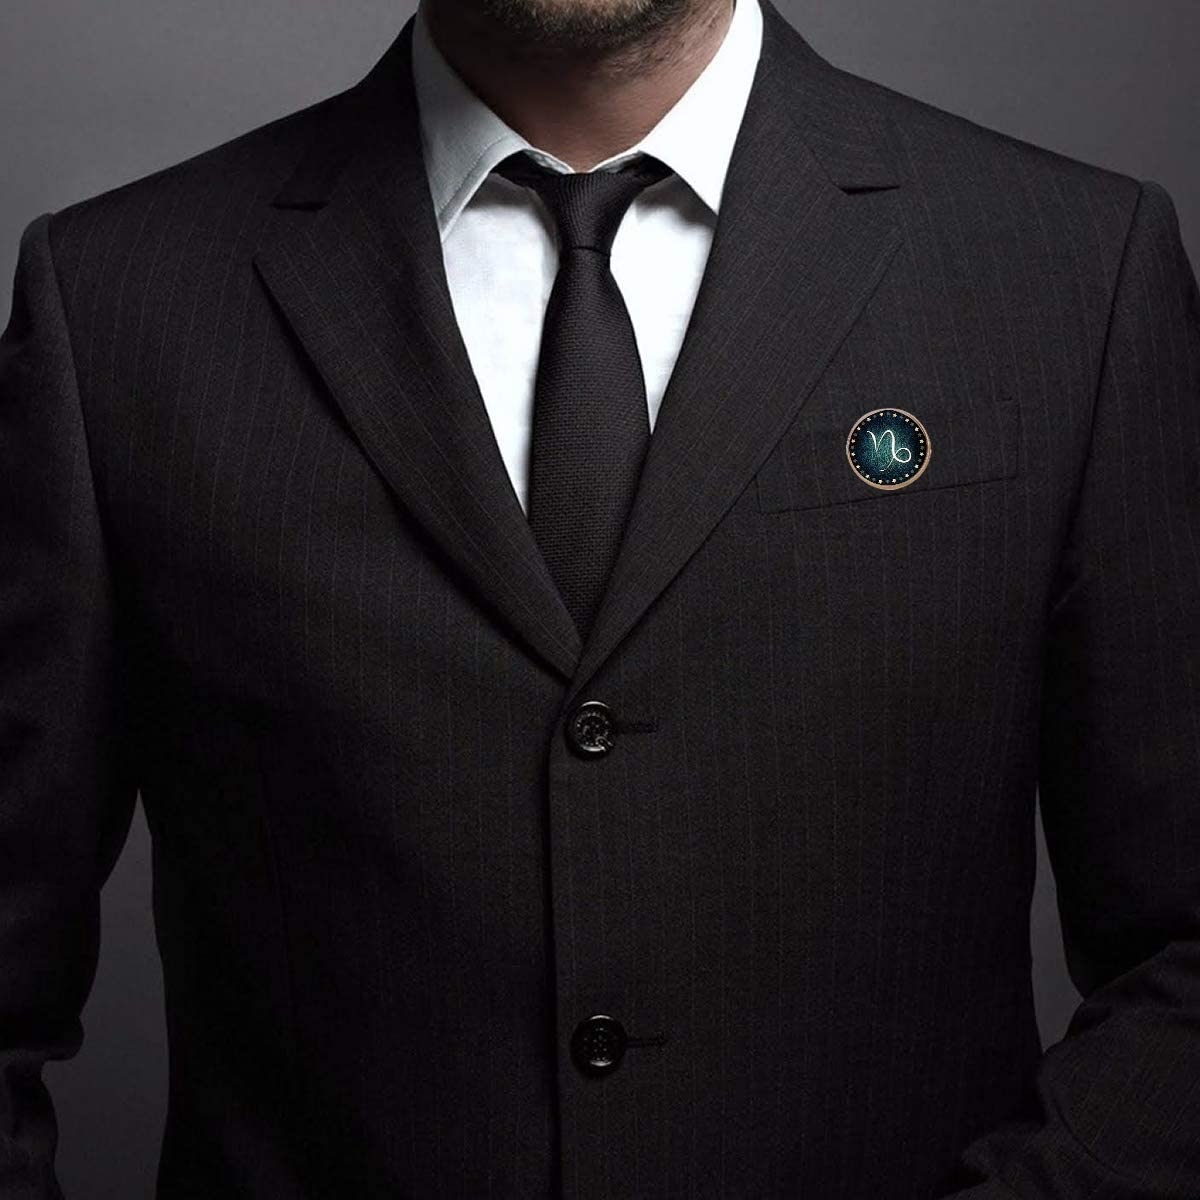 Pinback Buttons Badges Pins Capricorn Zodiac Lapel Pin Brooch Clip Trendy Accessory Jacket T-Shirt Bag Hat Shoe